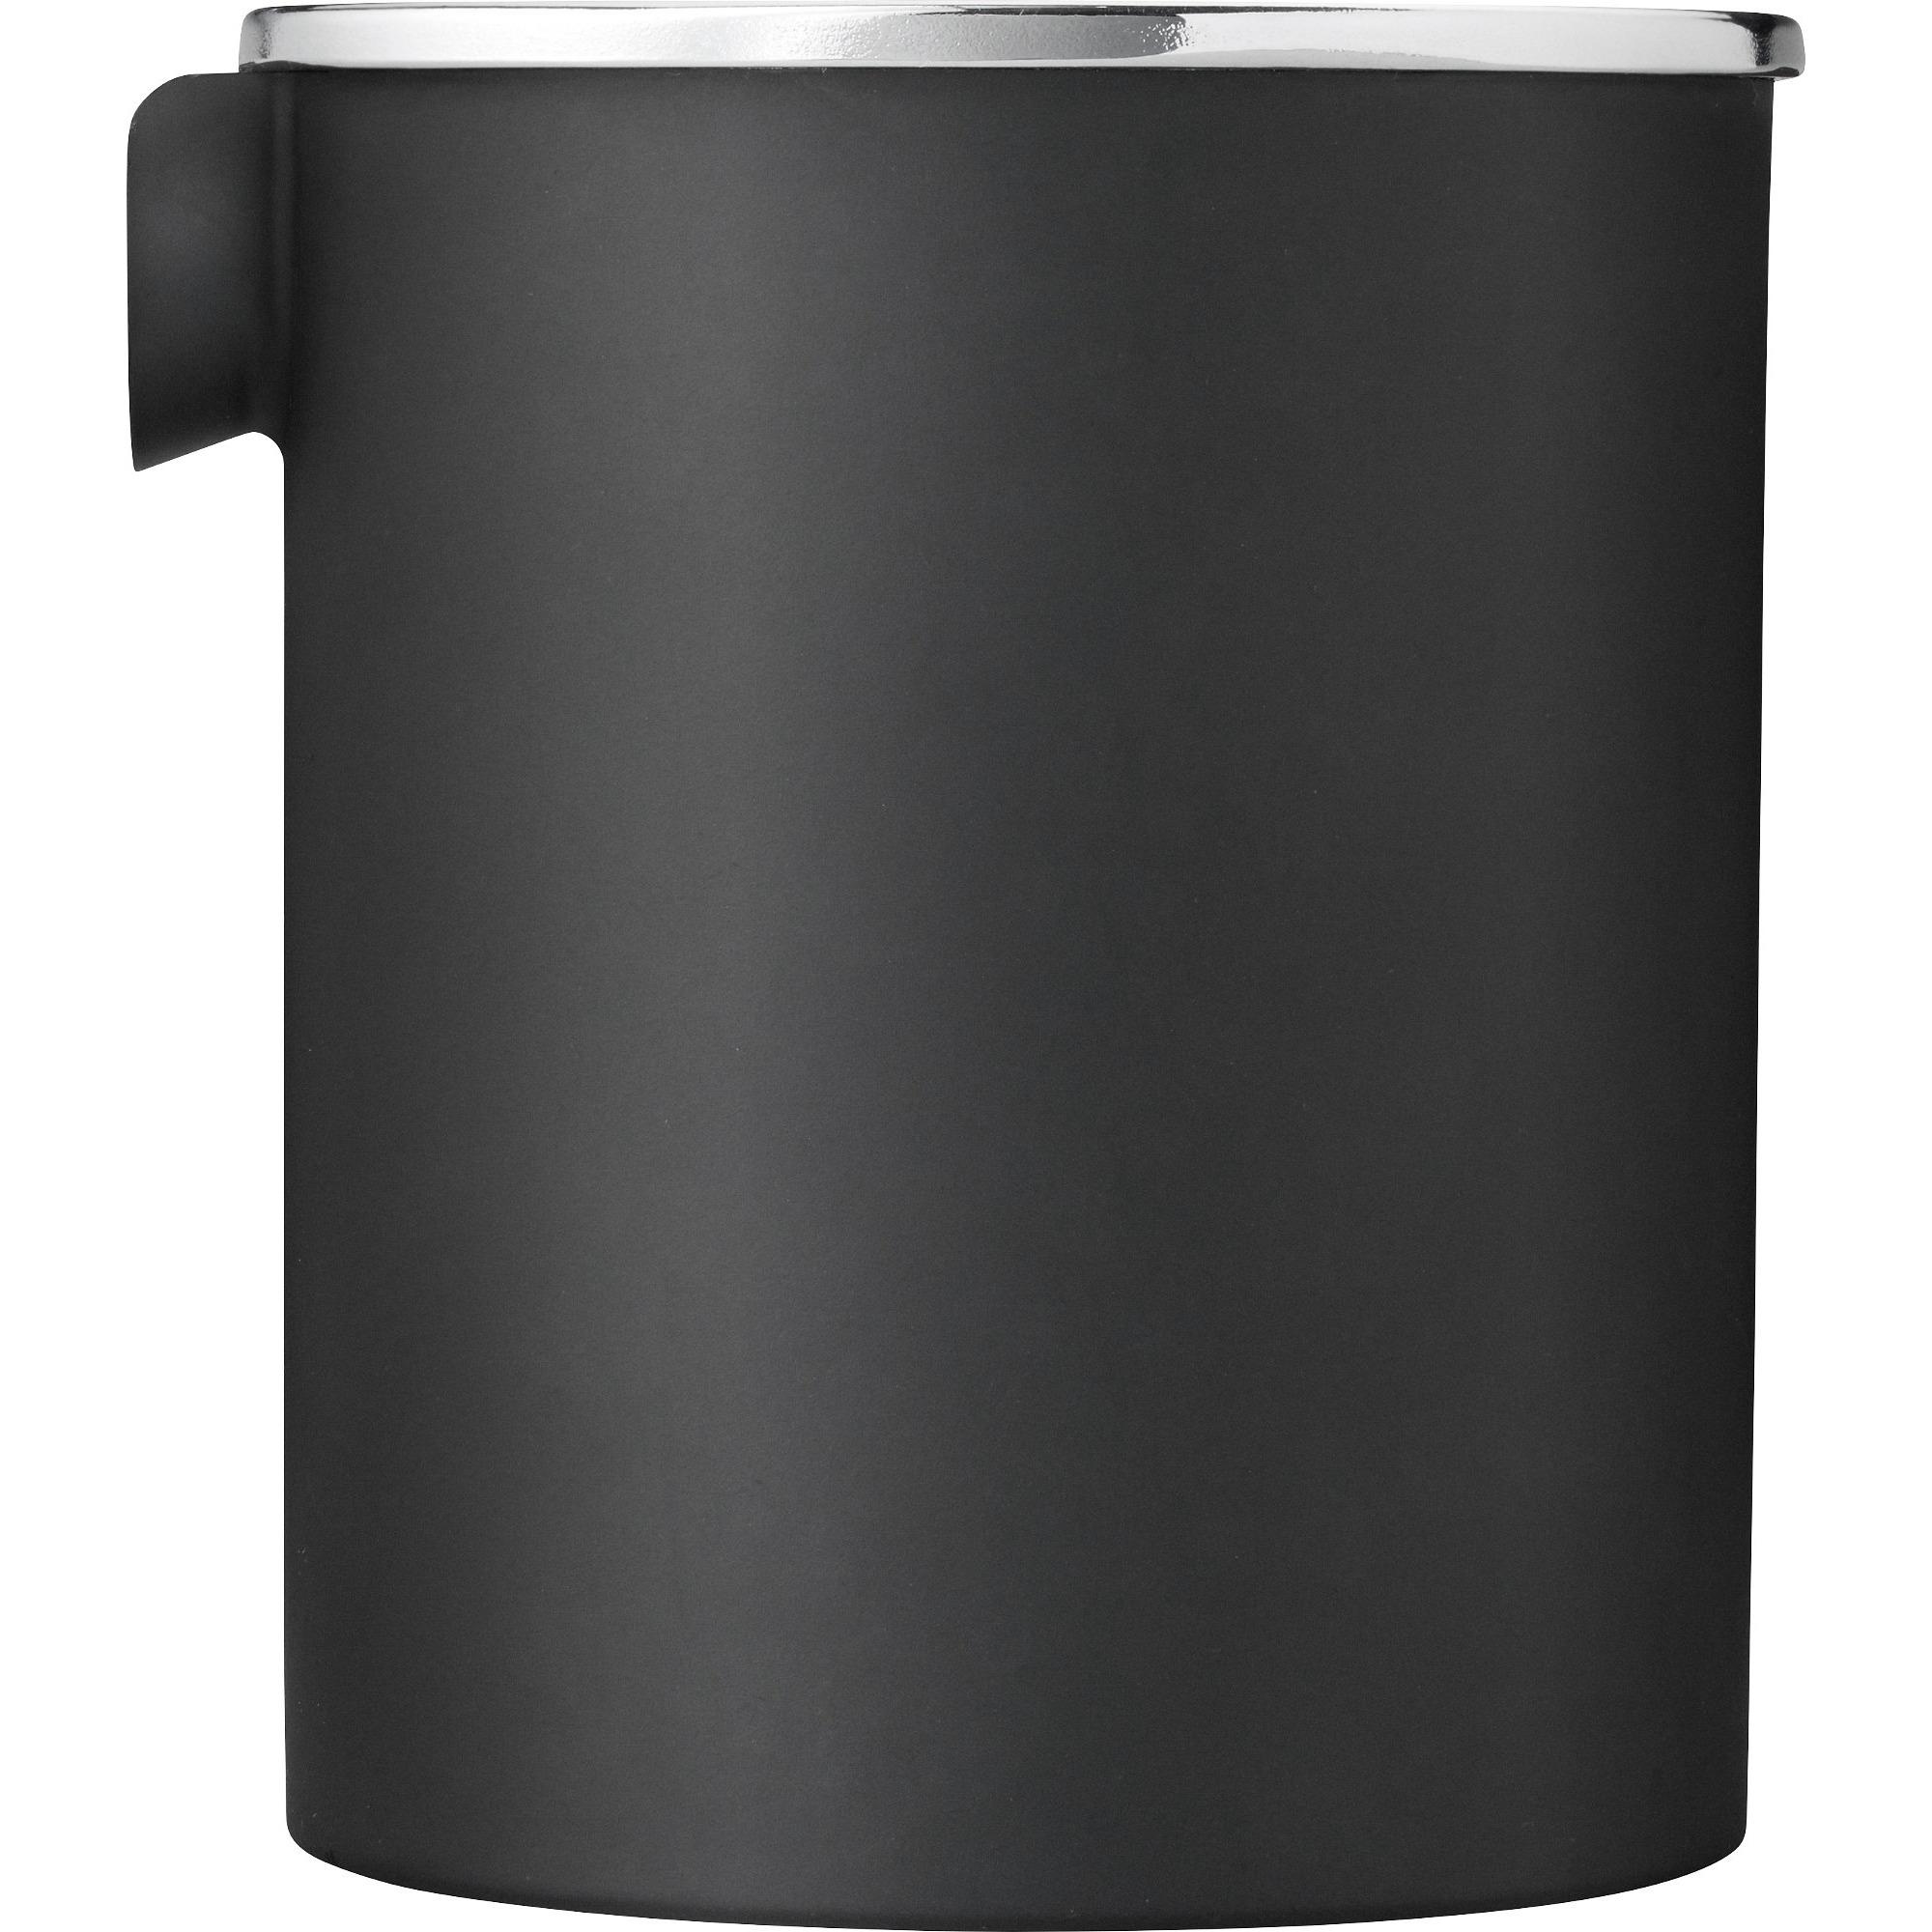 Stelton EM77 Reverse mjölkkanna 025 liter – matt svart/mirror